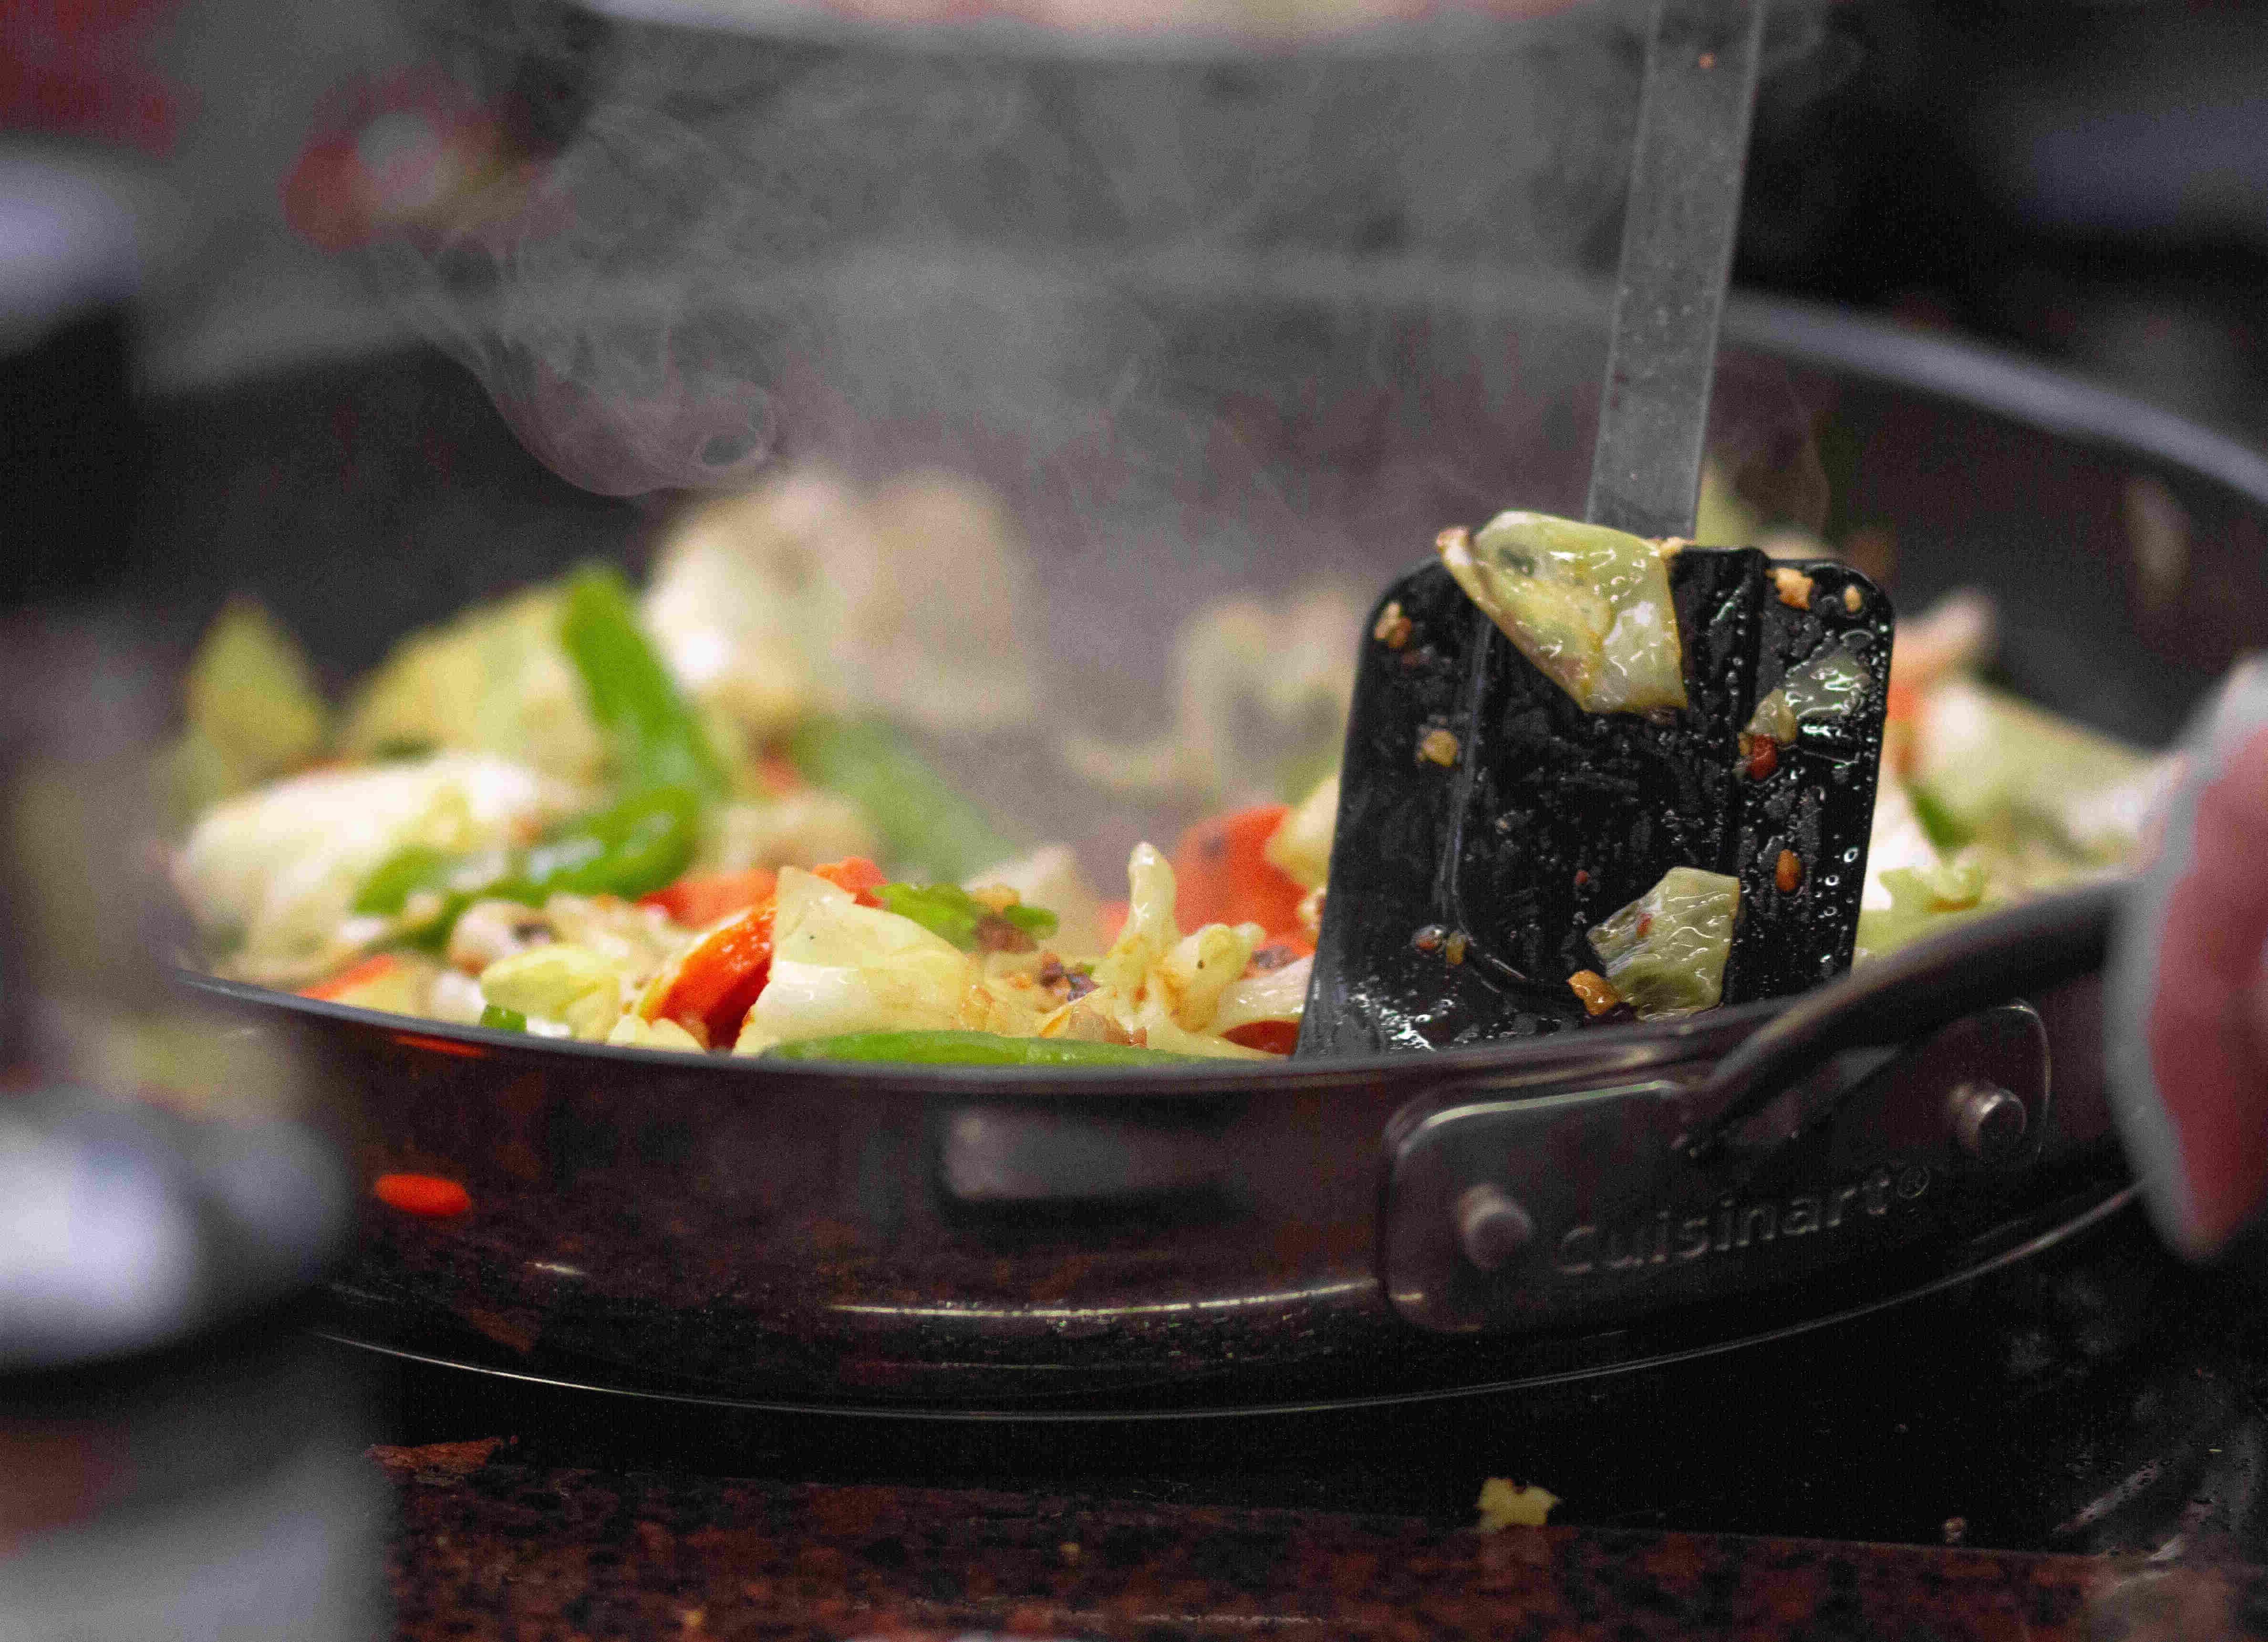 Stir fry in a large pan